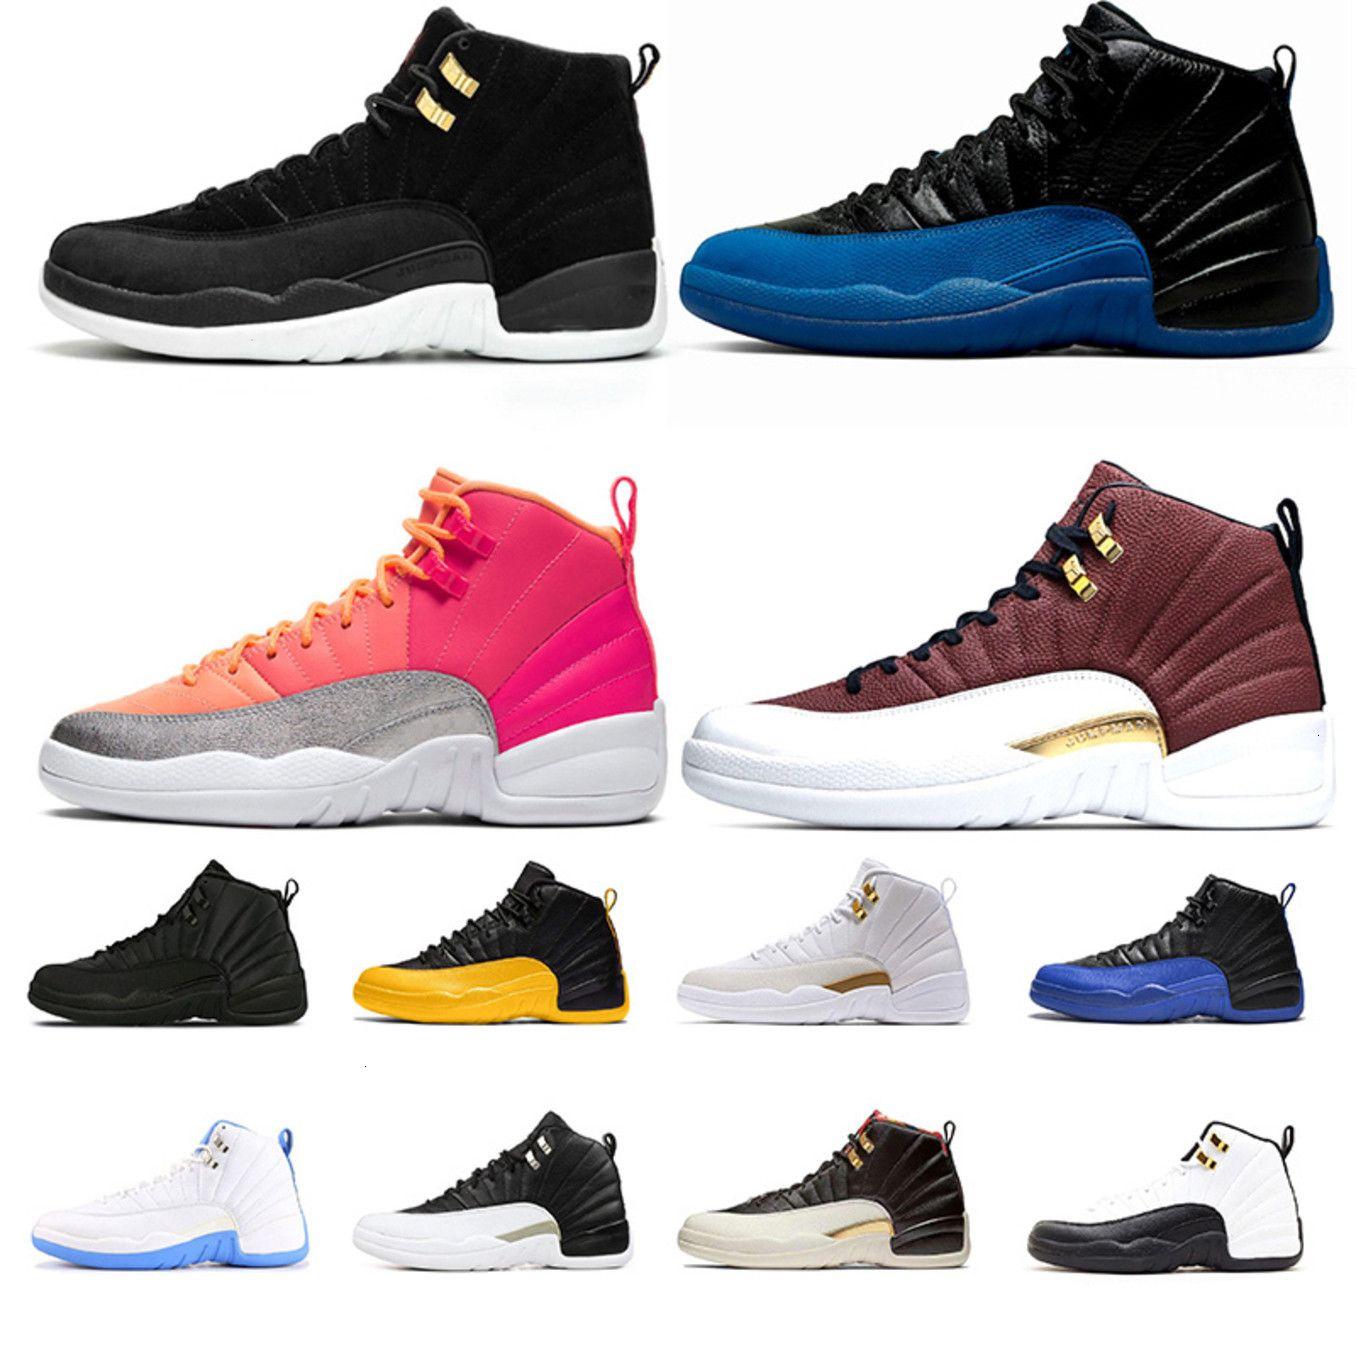 ГОРЯЧЕЙ! 12 Обувь Basetball 12s Hot Punch Reverse Taxi Game Ball Fiba Basetball Shoes 12s Mens Trainers Sports Shoe 8-13